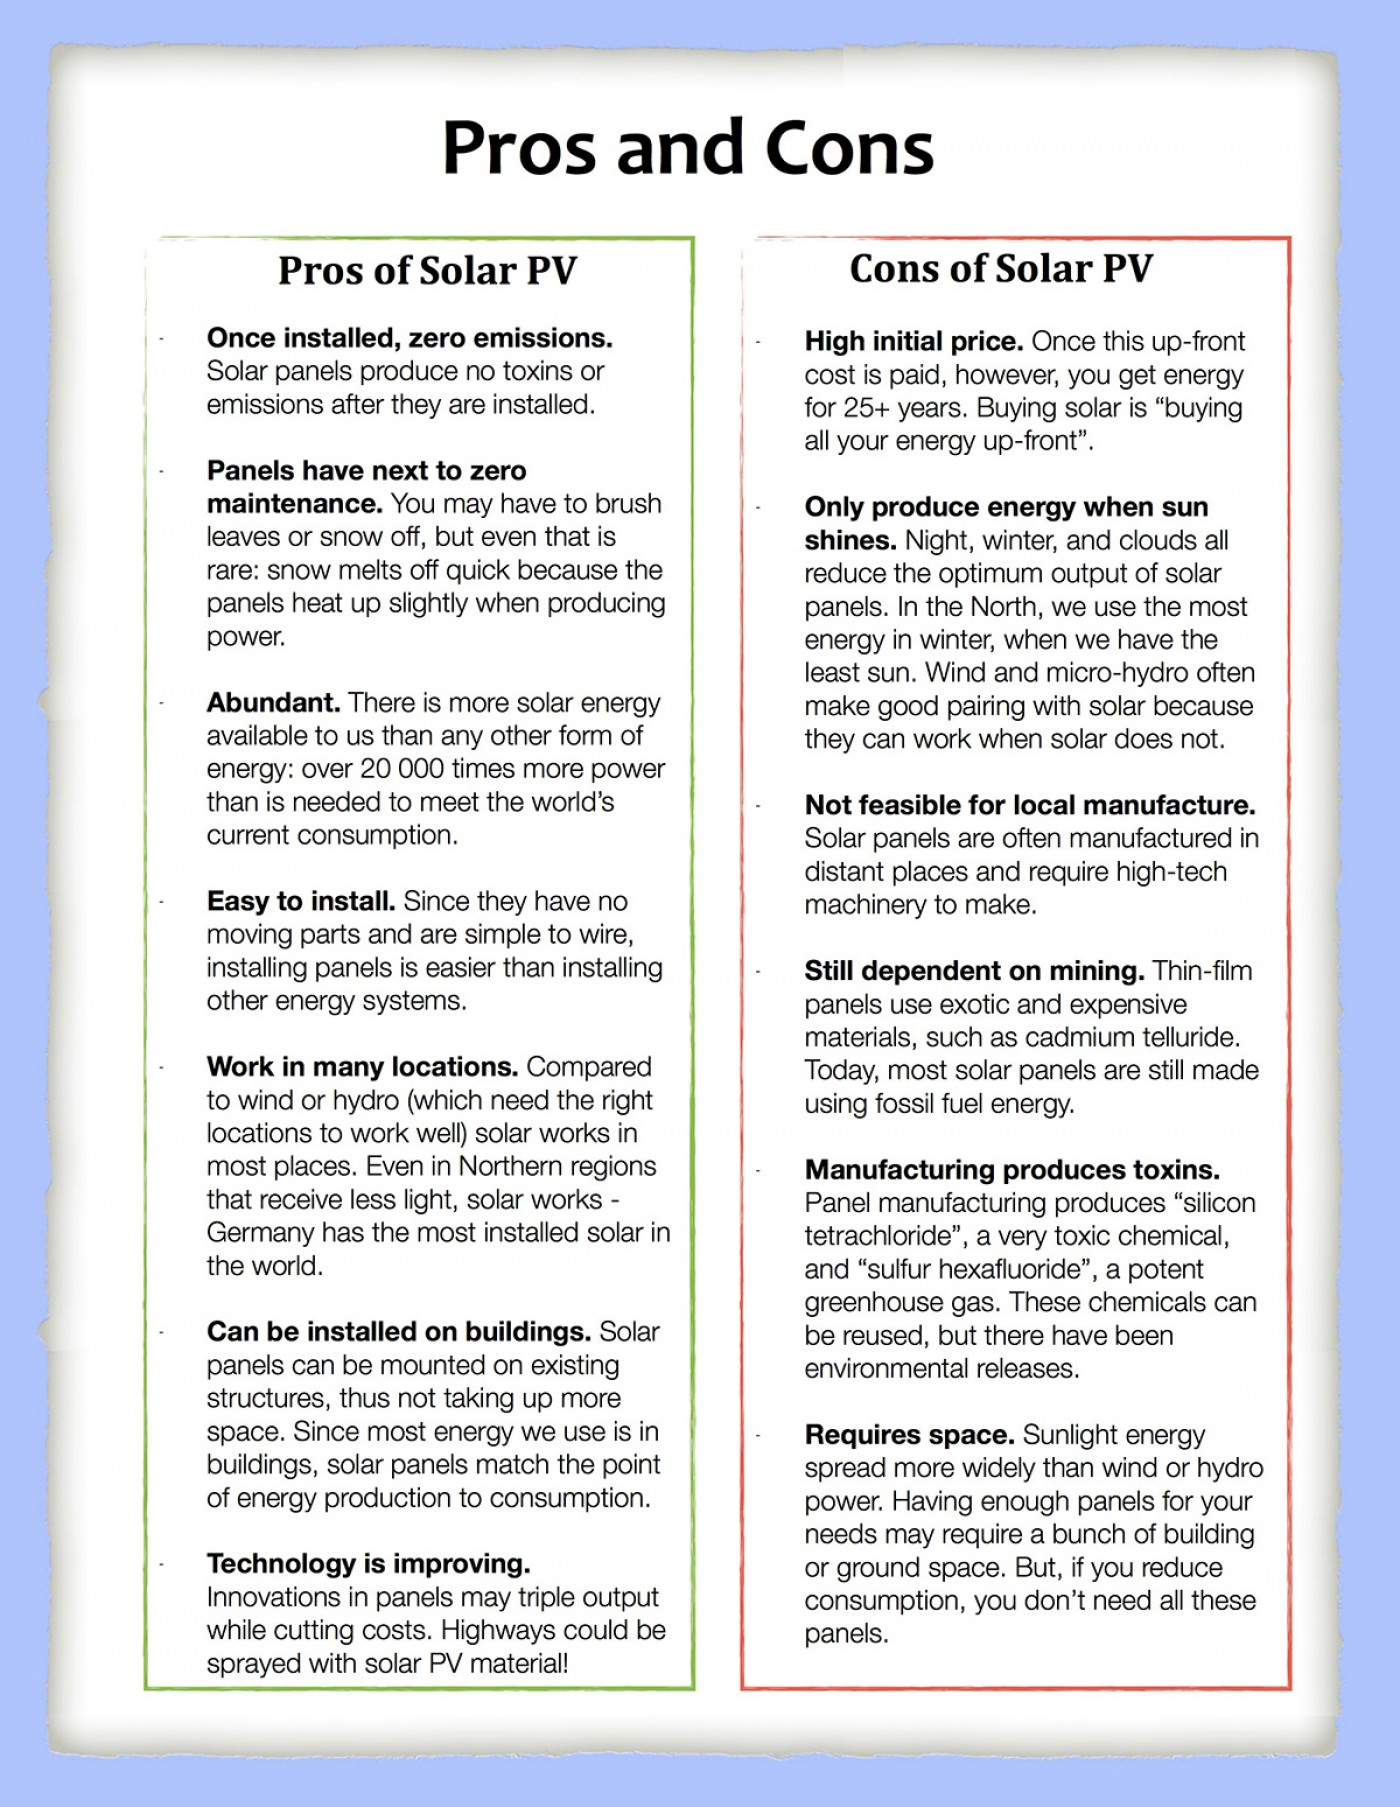 006 Solarposter6 Should Students Wear School Uniforms Essay Impressive Pdf High Have To 1400